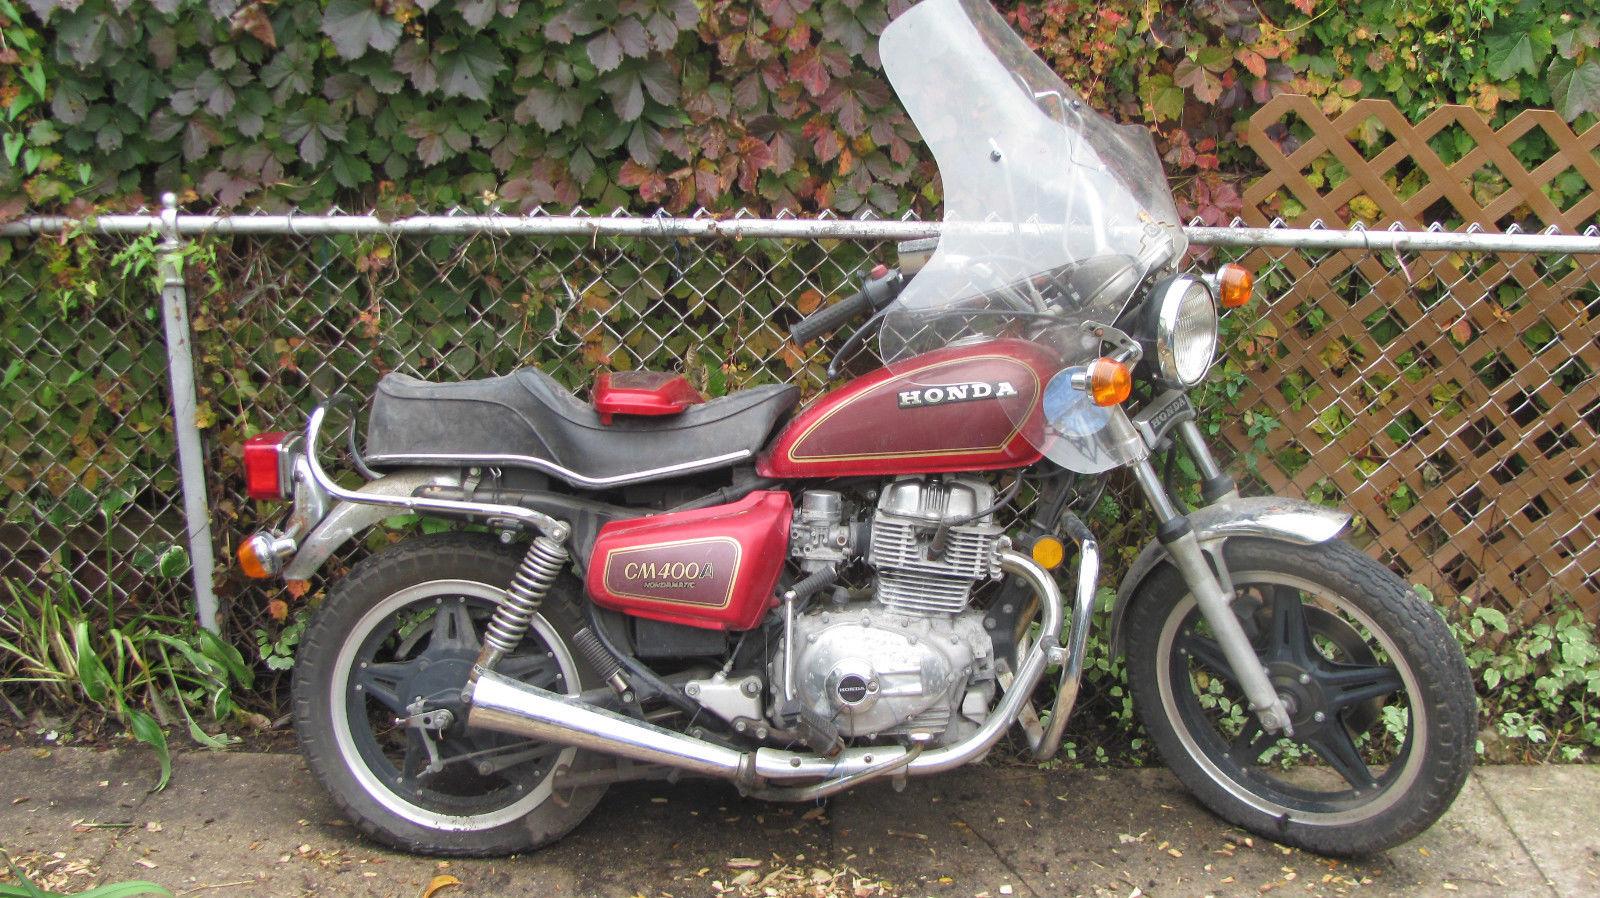 1982 Honda Cm450honda Cm450 A Hondamatic Moto Zombdrive Com Ca175 Wiring Diagram Motorcycle